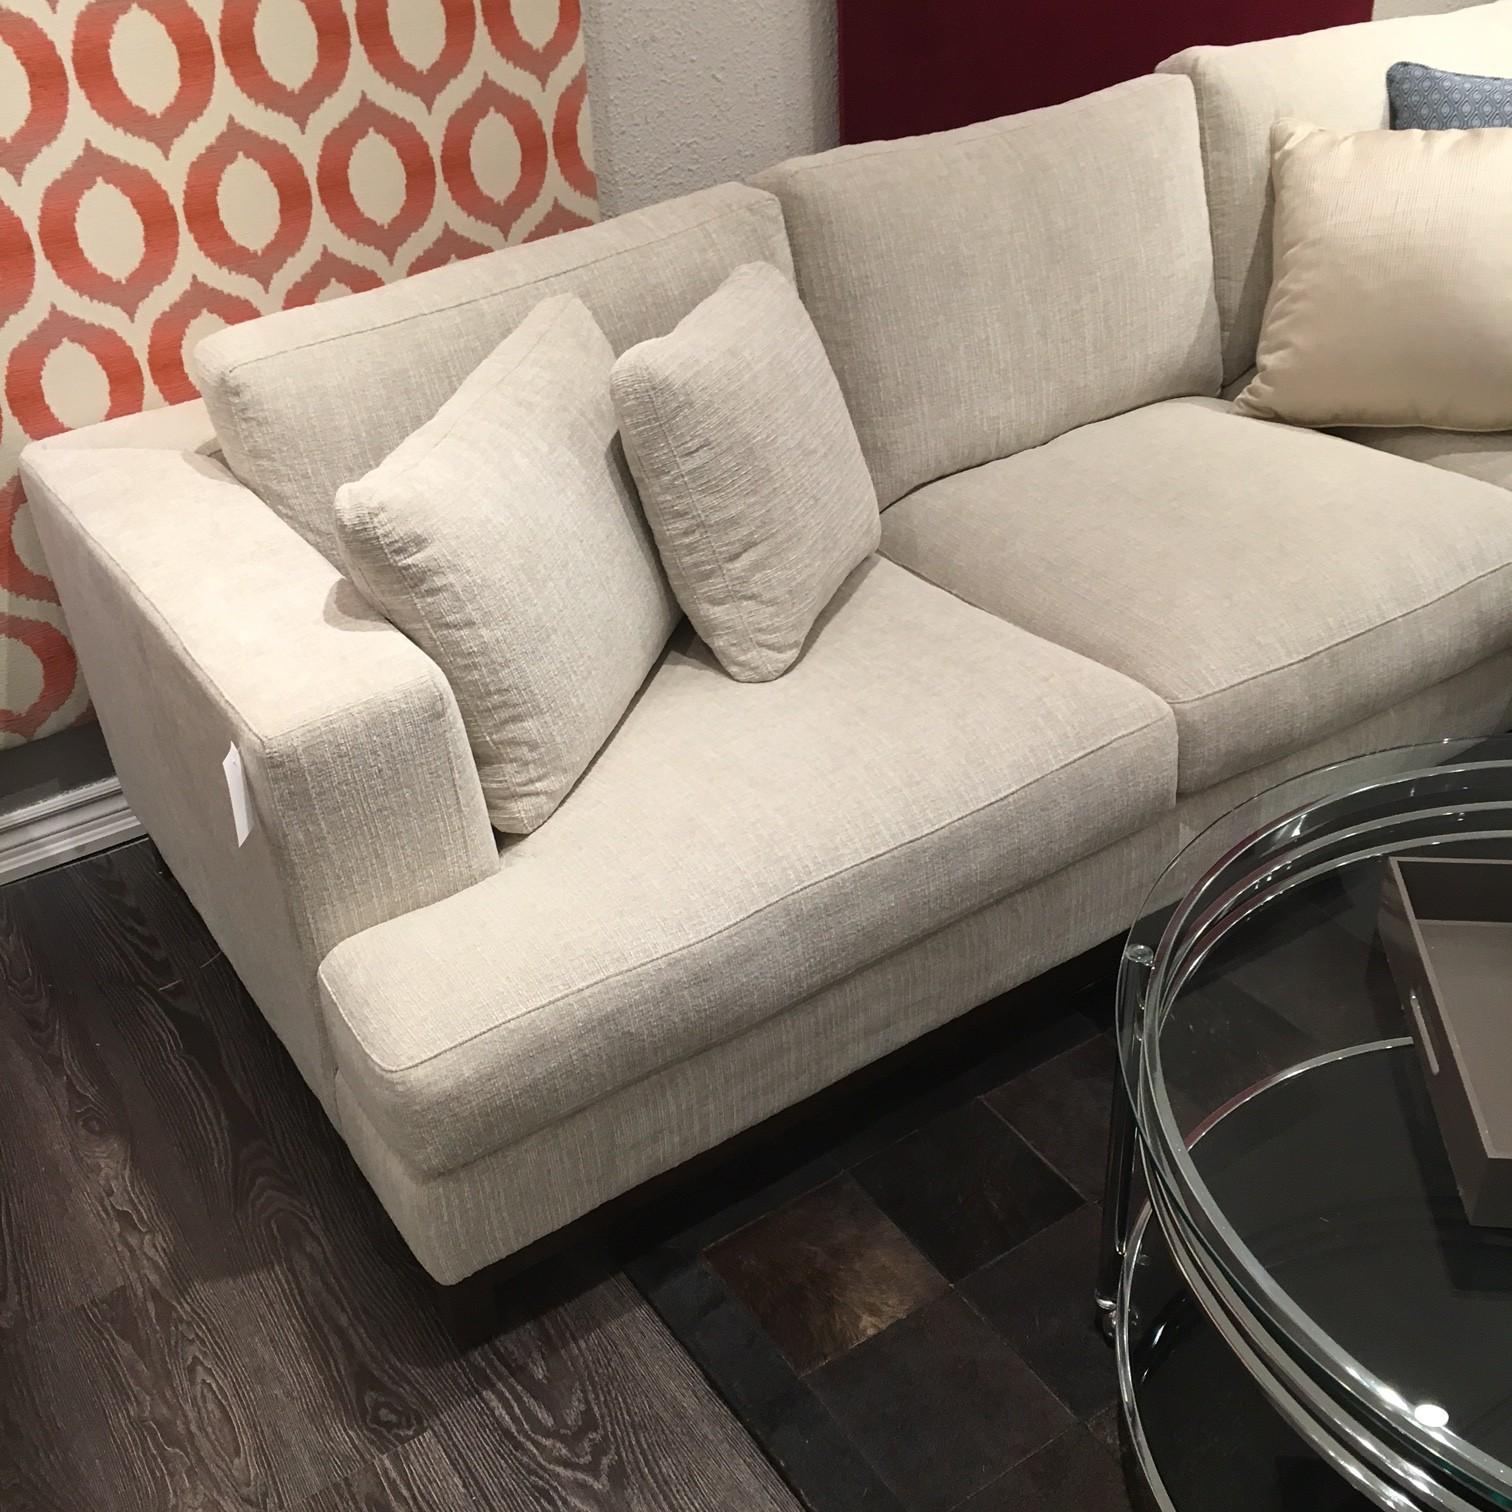 Canadian Furniture Stores: Polanco Furniture Store Ottawa